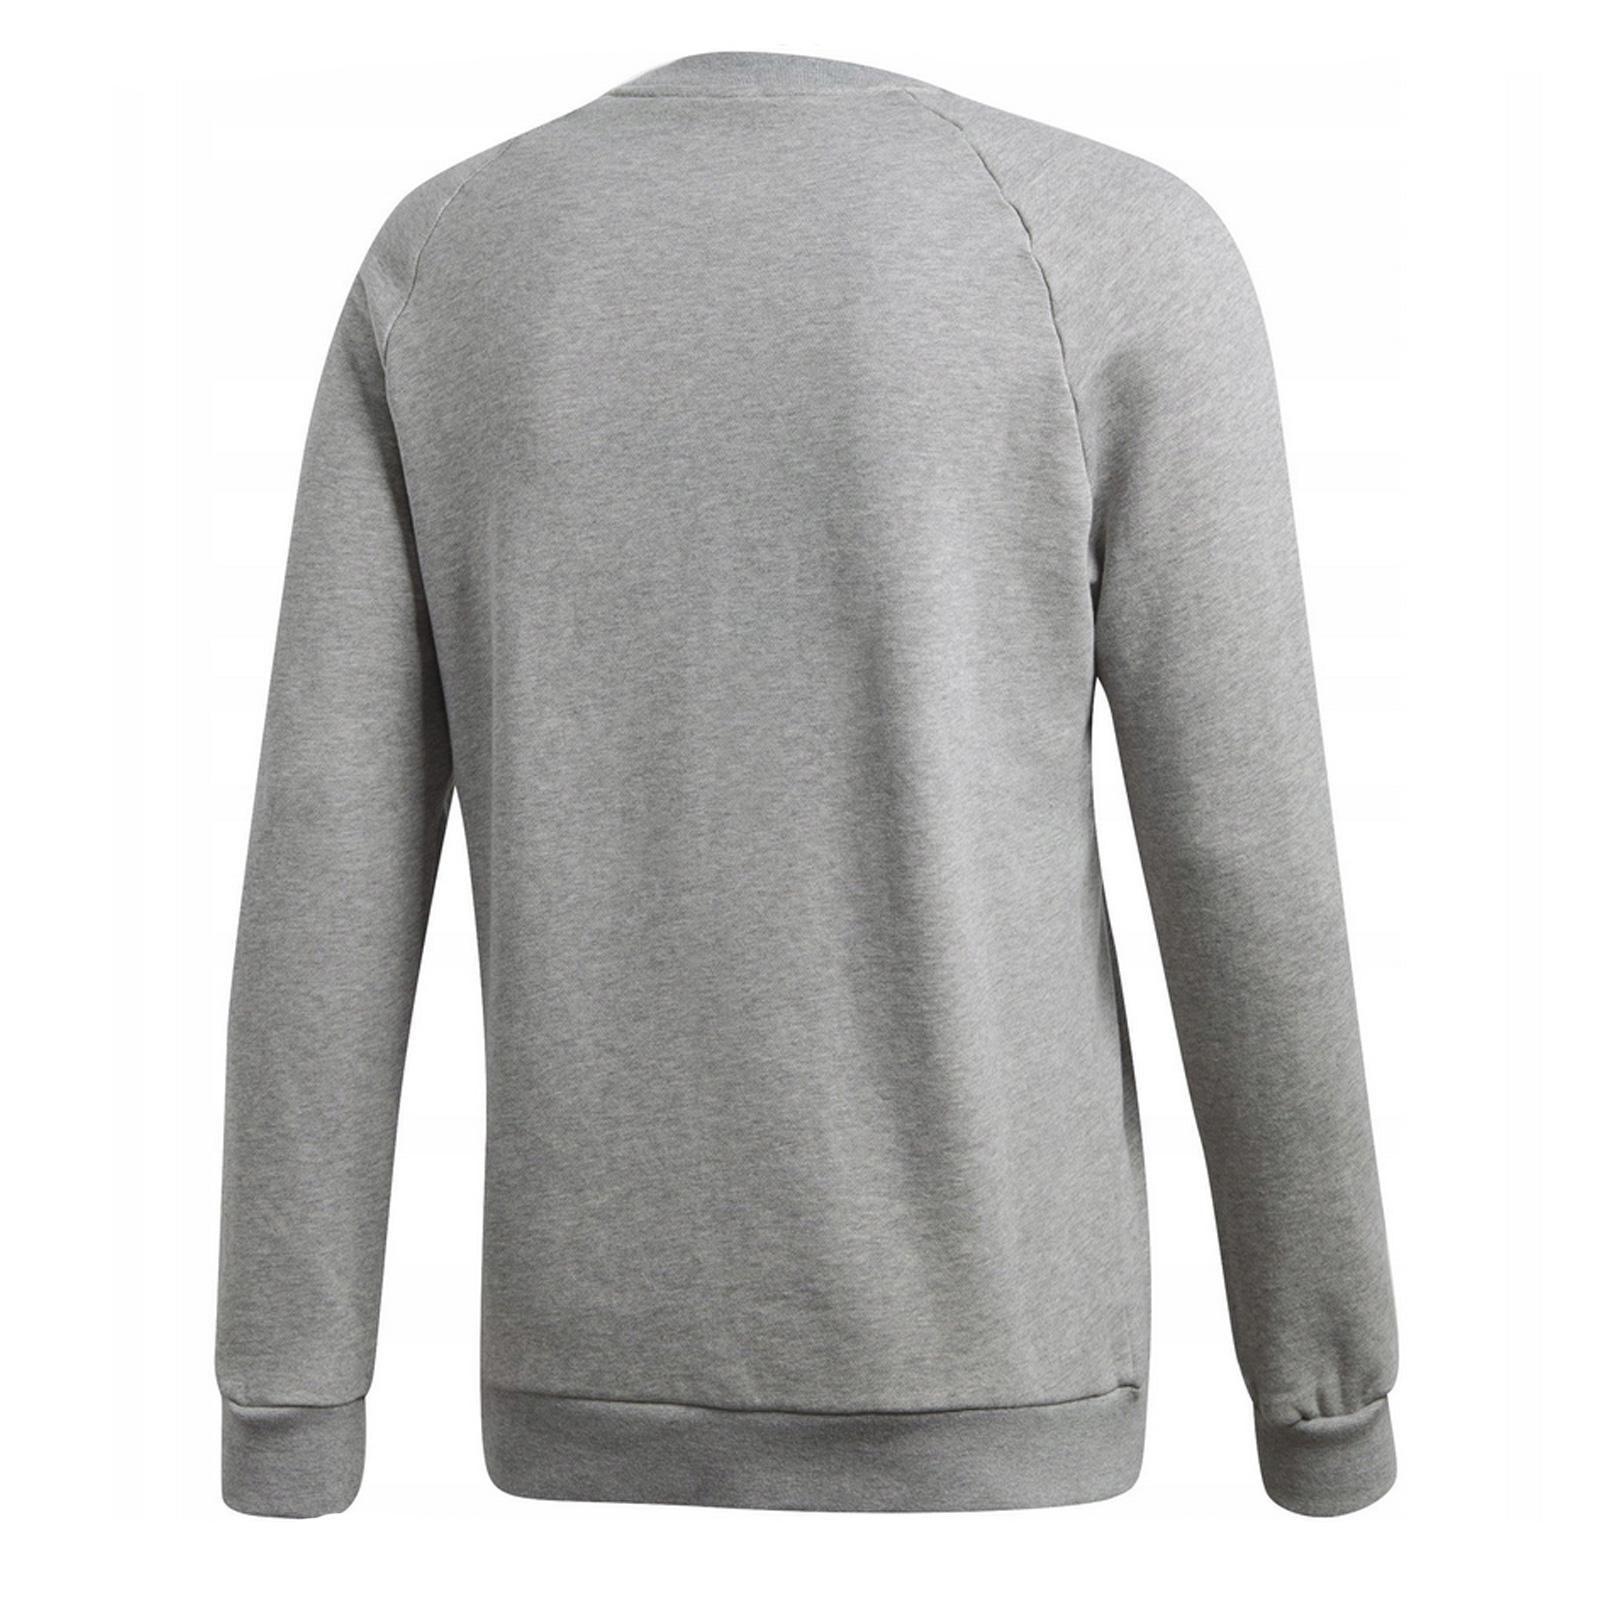 Details zu adidas Originals Pantone Crew Herren Sweatshirt Farbkarte Sweater DH4785 Grau